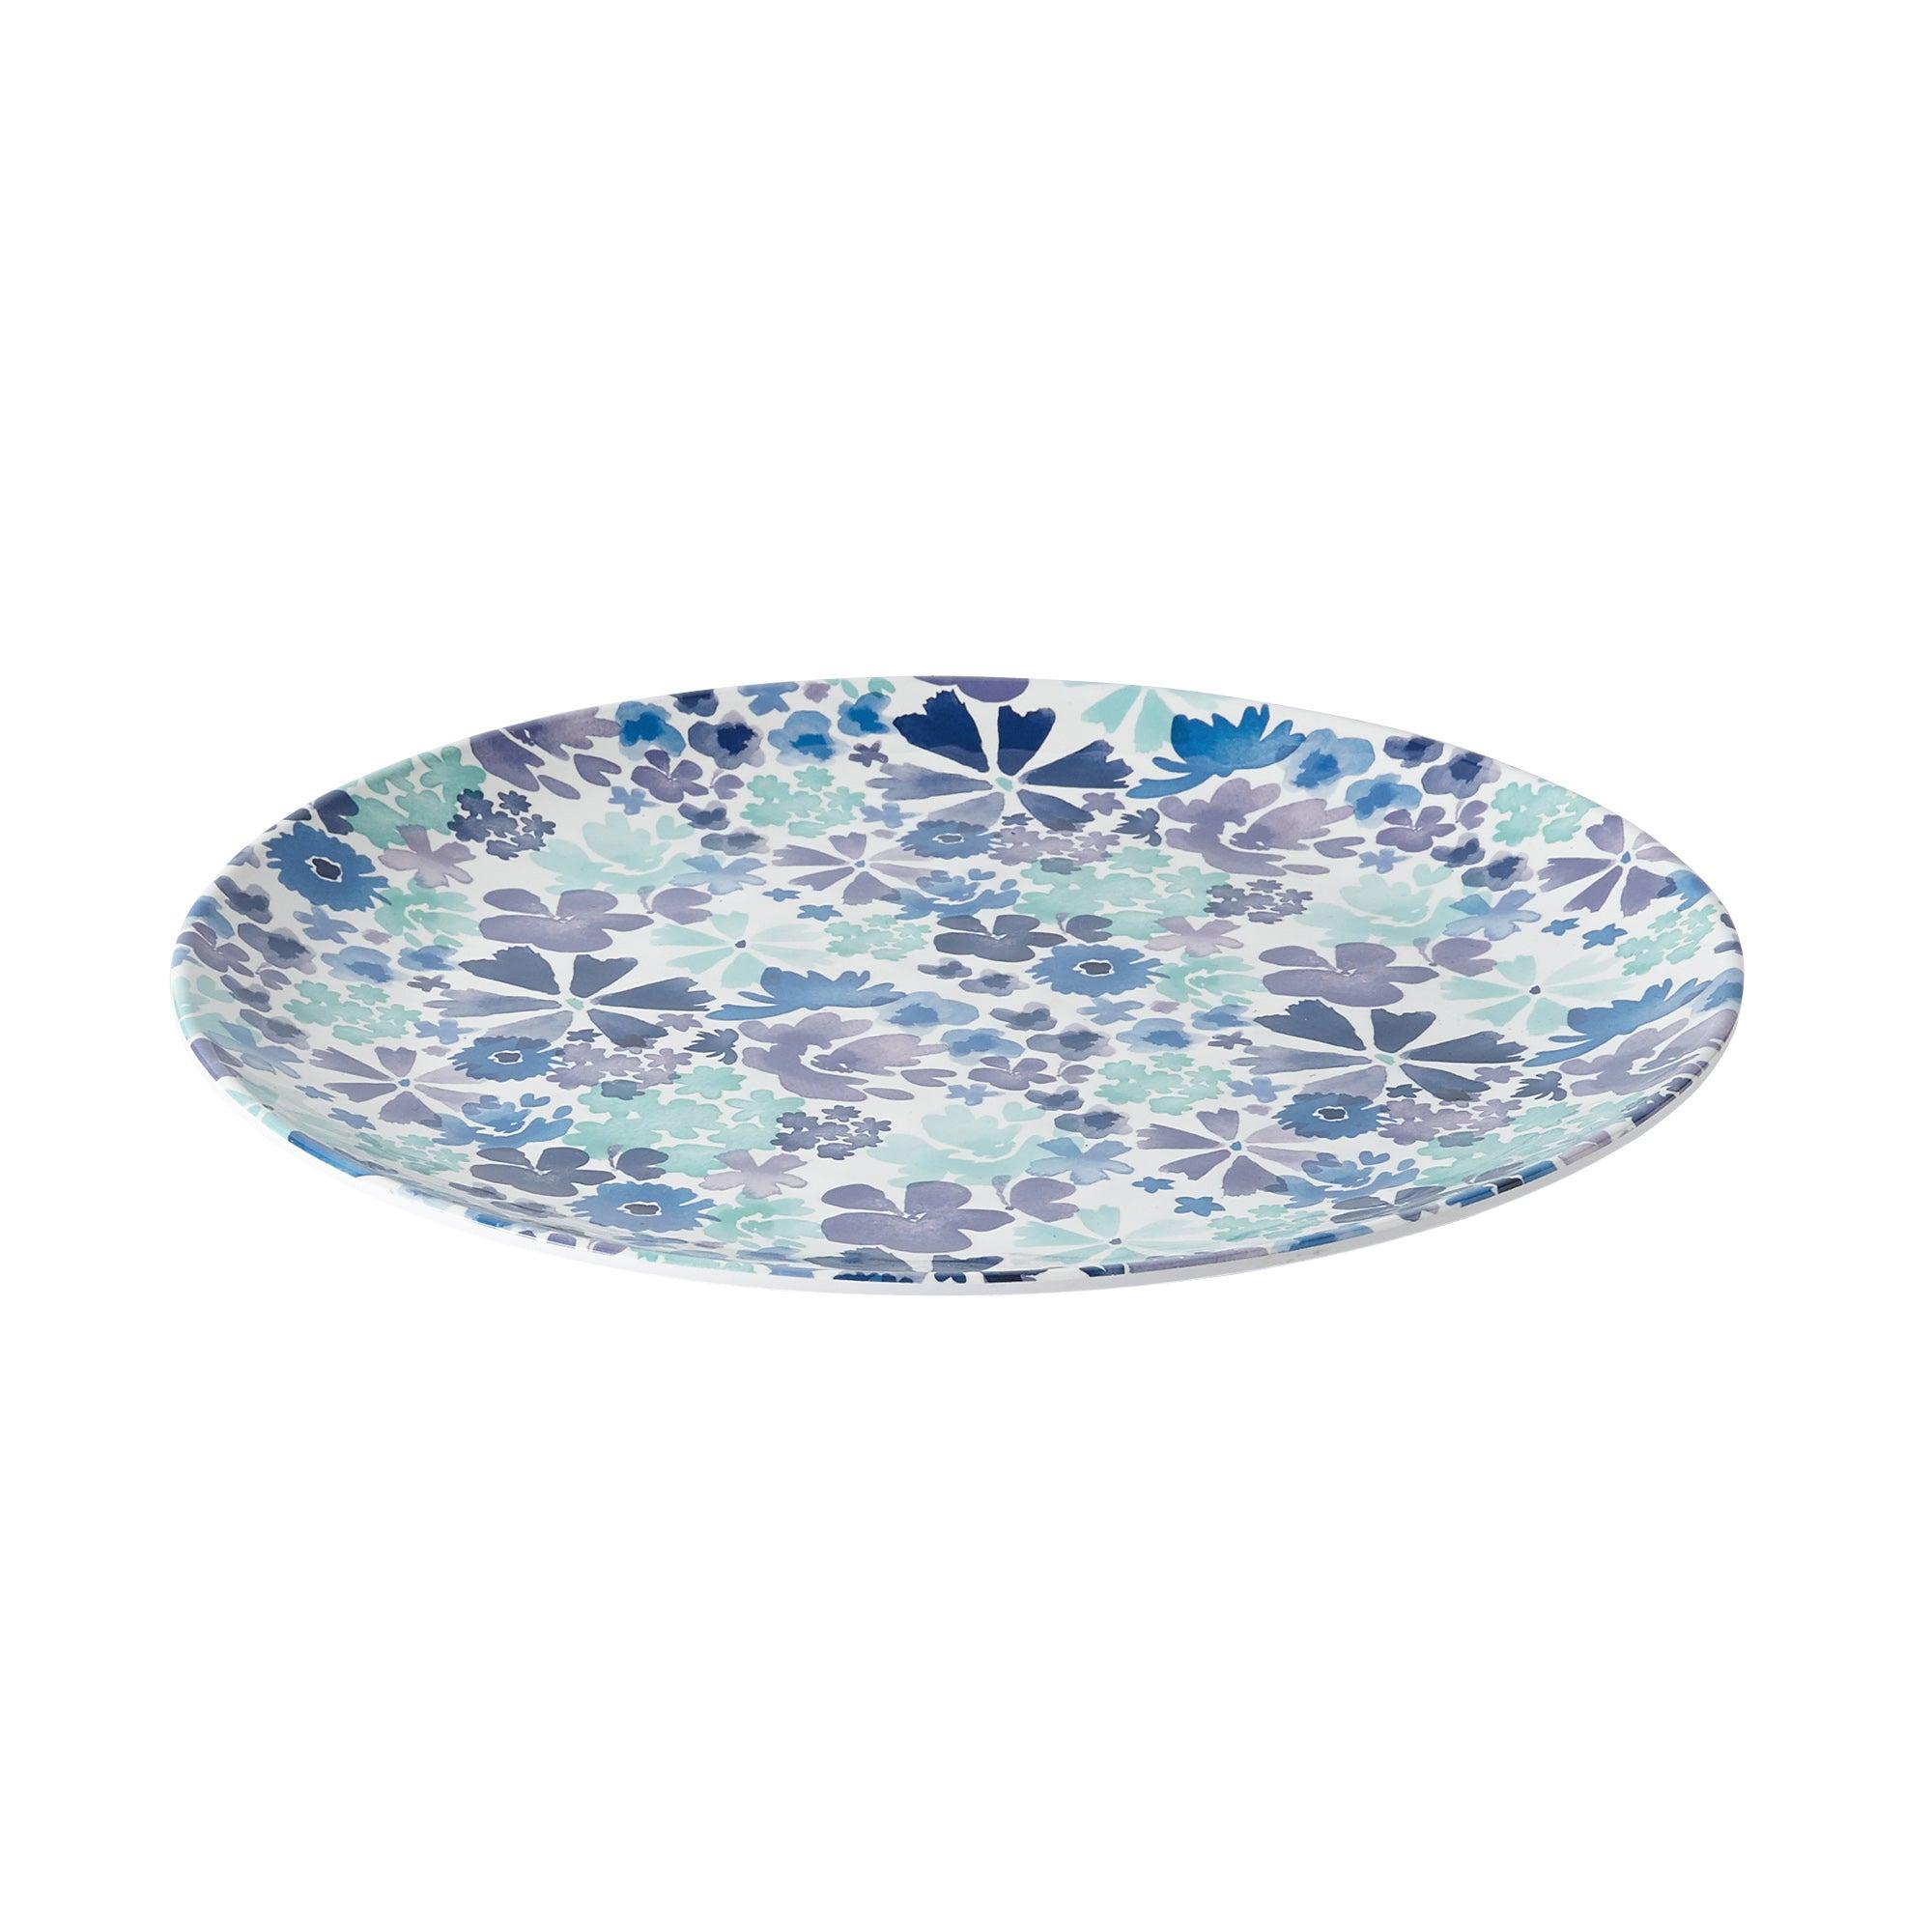 Image of Scattered Flowers Melamine Round Platter Blue